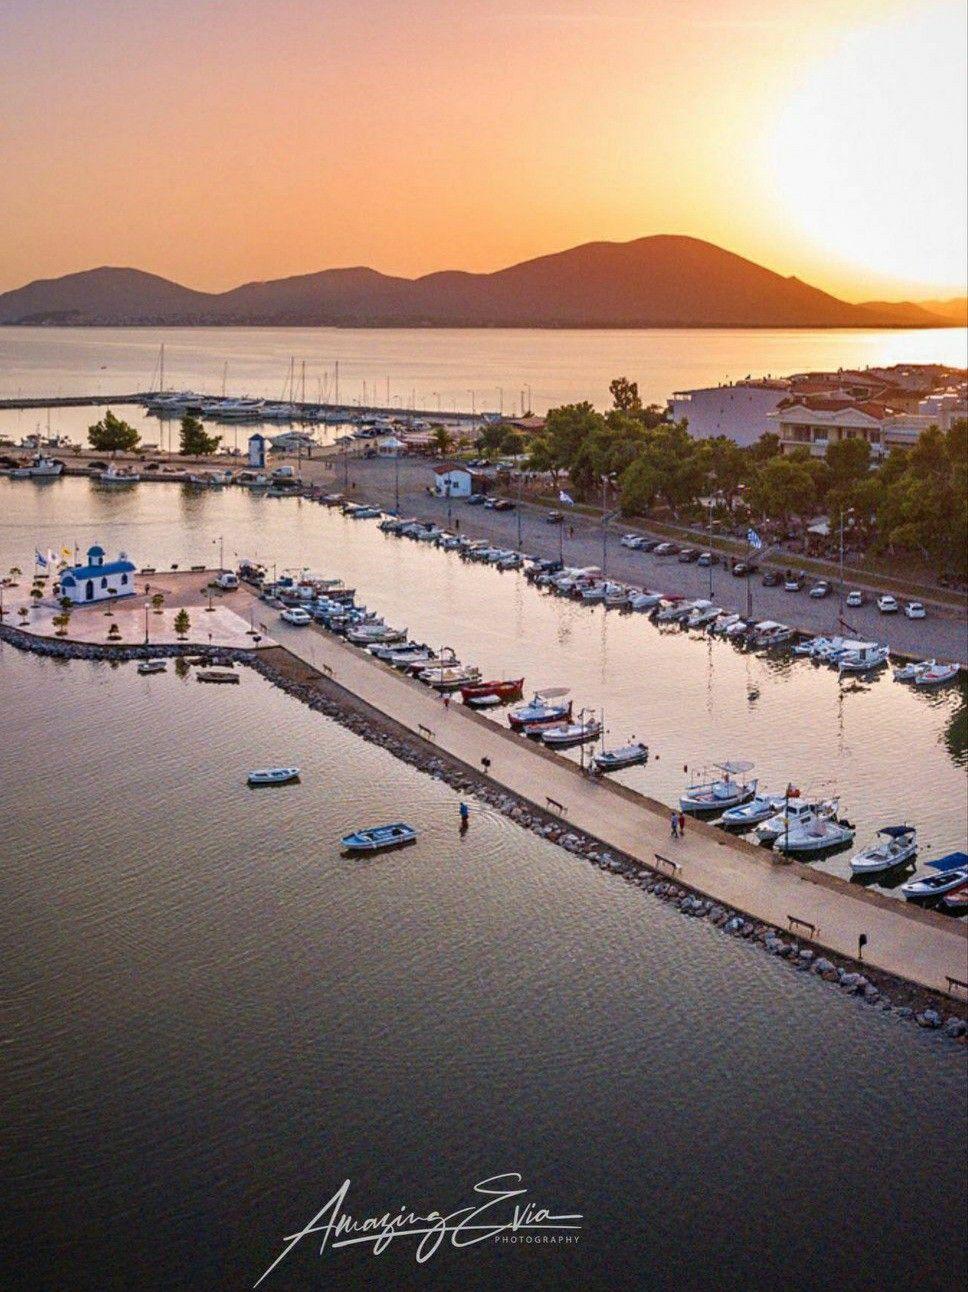 Nea Artaki is an iconic place for a quick getaway from the city!🍽☕🚴♀️ #amazingeviagr, #greece, #Evia,#eviaisland, #exploregreece,#theworldshotz, #travelcapture,#discovereurope, #illgrams,#electricshotz,#igers_greece,#travelblogger,#voyaged,#tonekillers